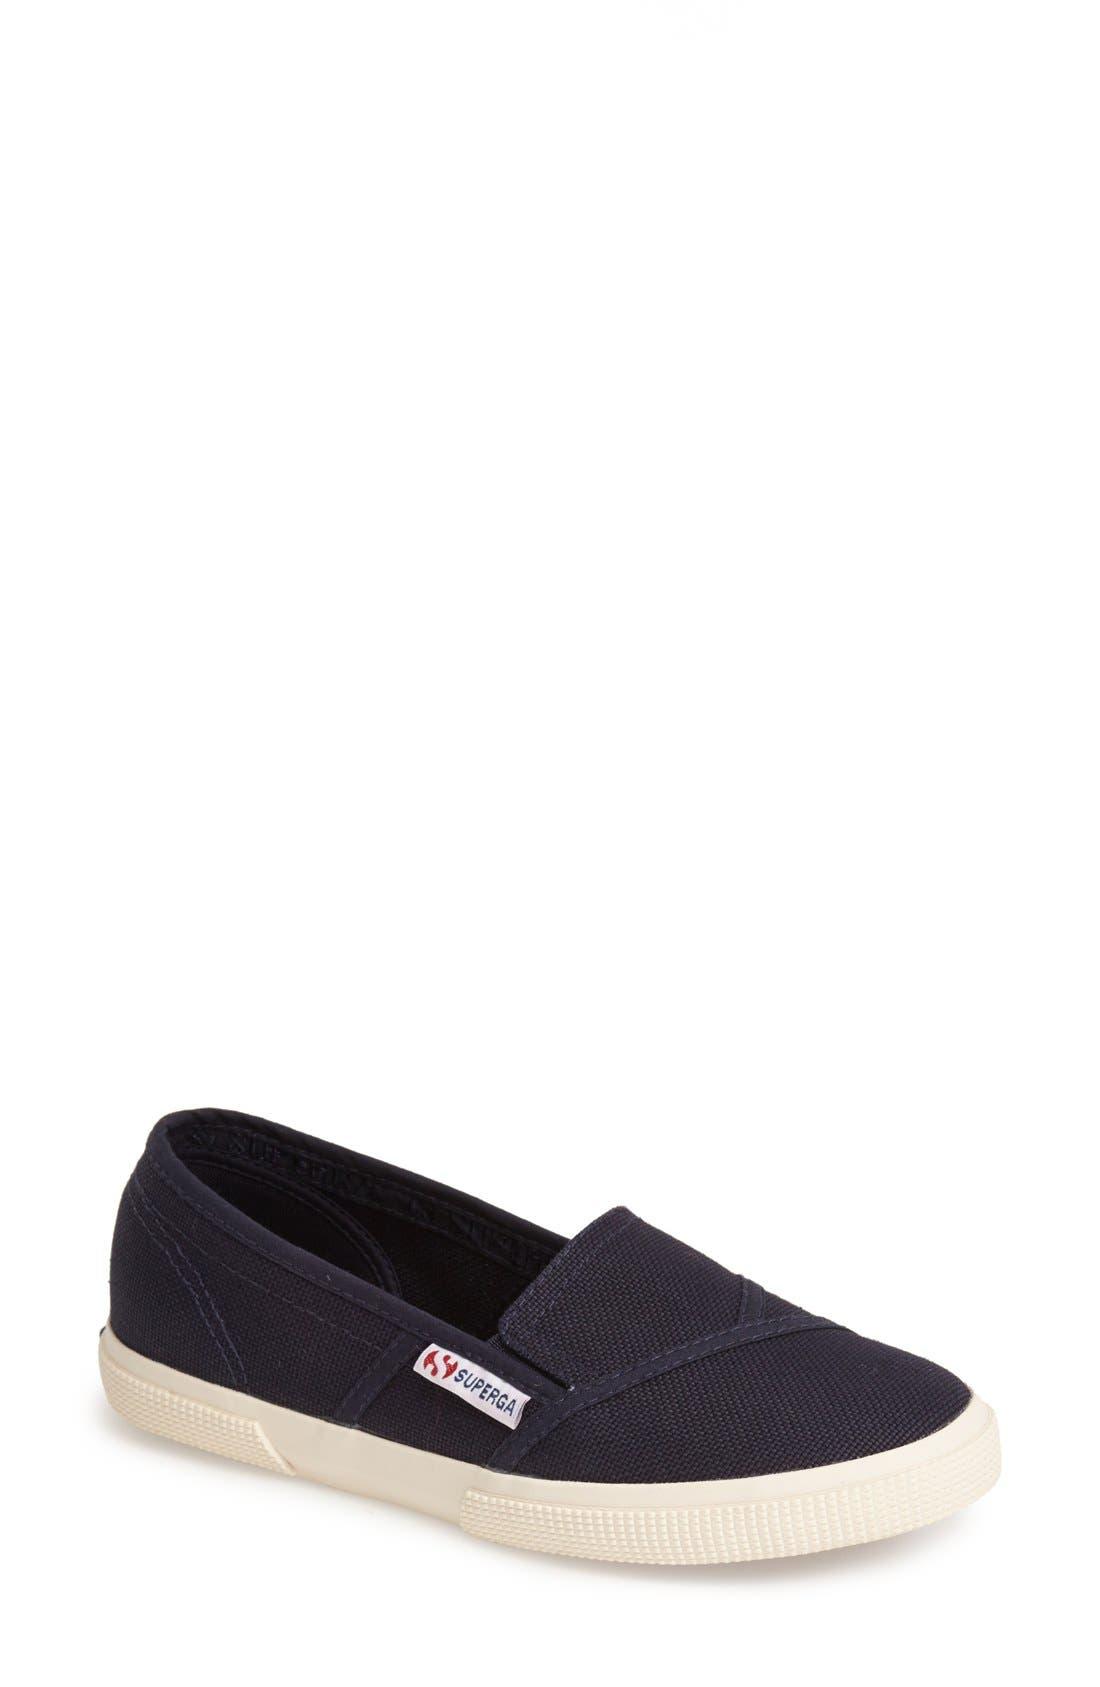 Alternate Image 1 Selected - Superga 'A Line' Sneaker (Women)